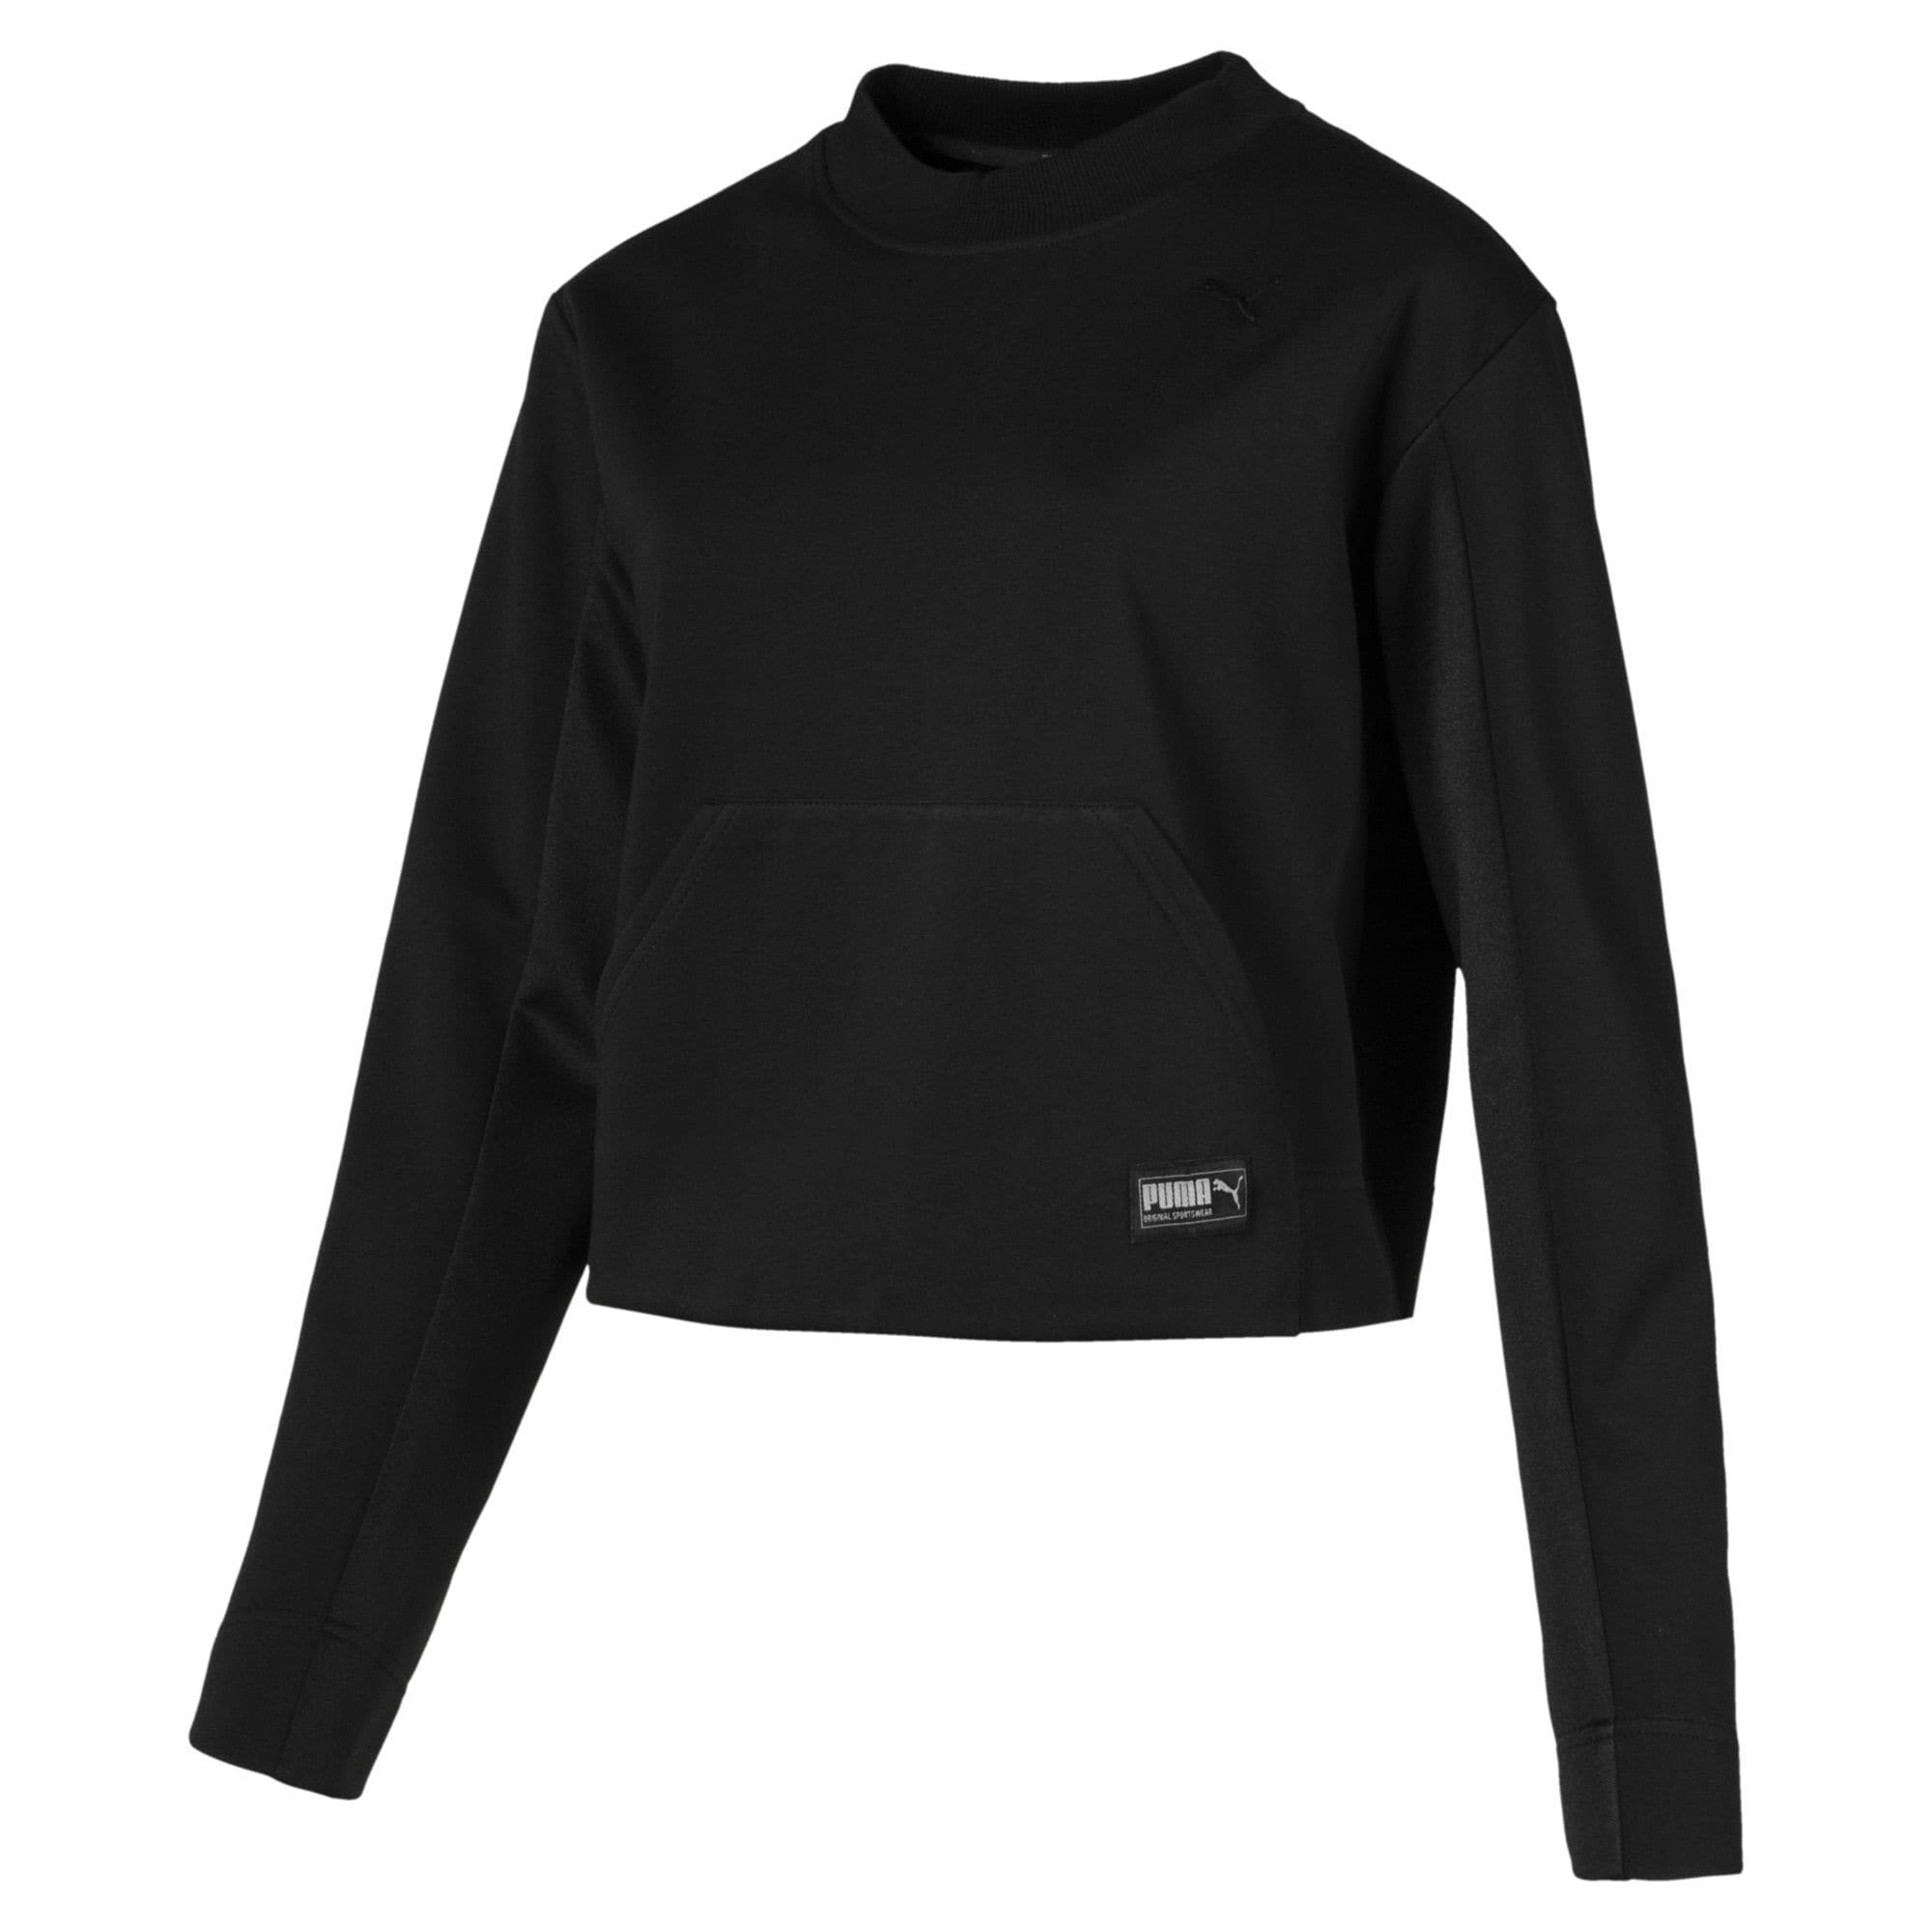 PUMA, Dames Sweatshirt 'Fusion', grijs / zwart